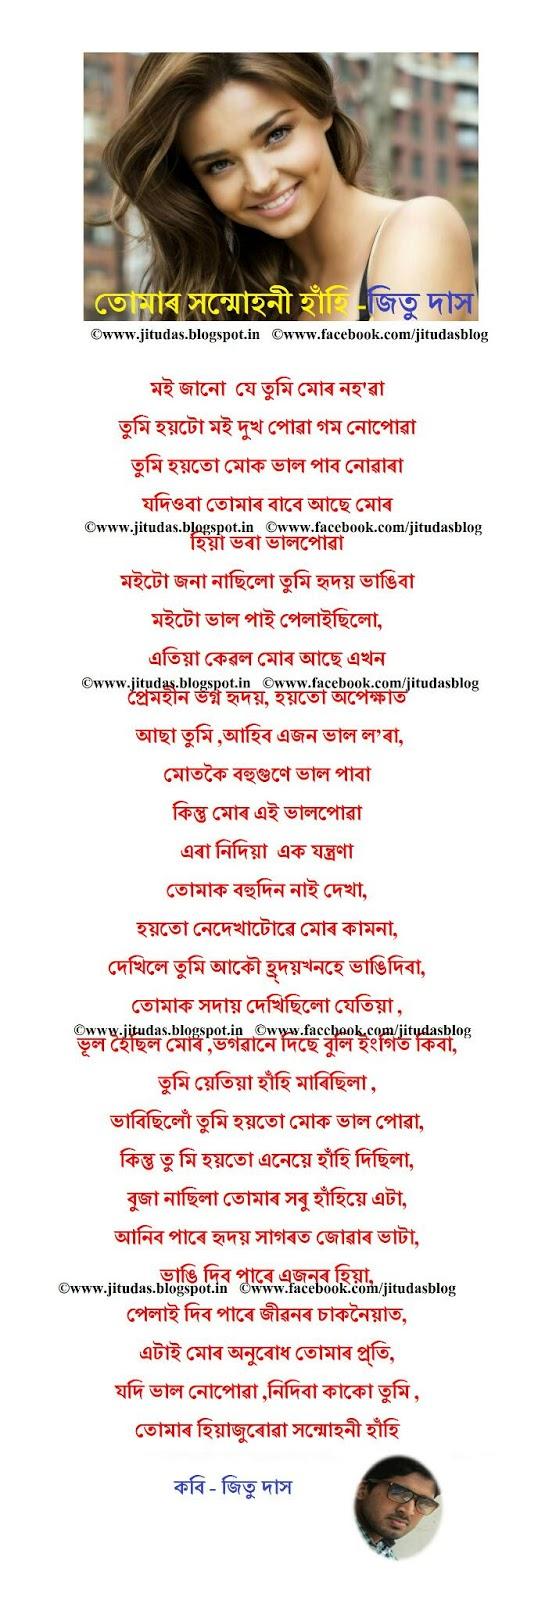 Assamese sad love poem তোমাৰ সন্মোহণী হাঁহি by